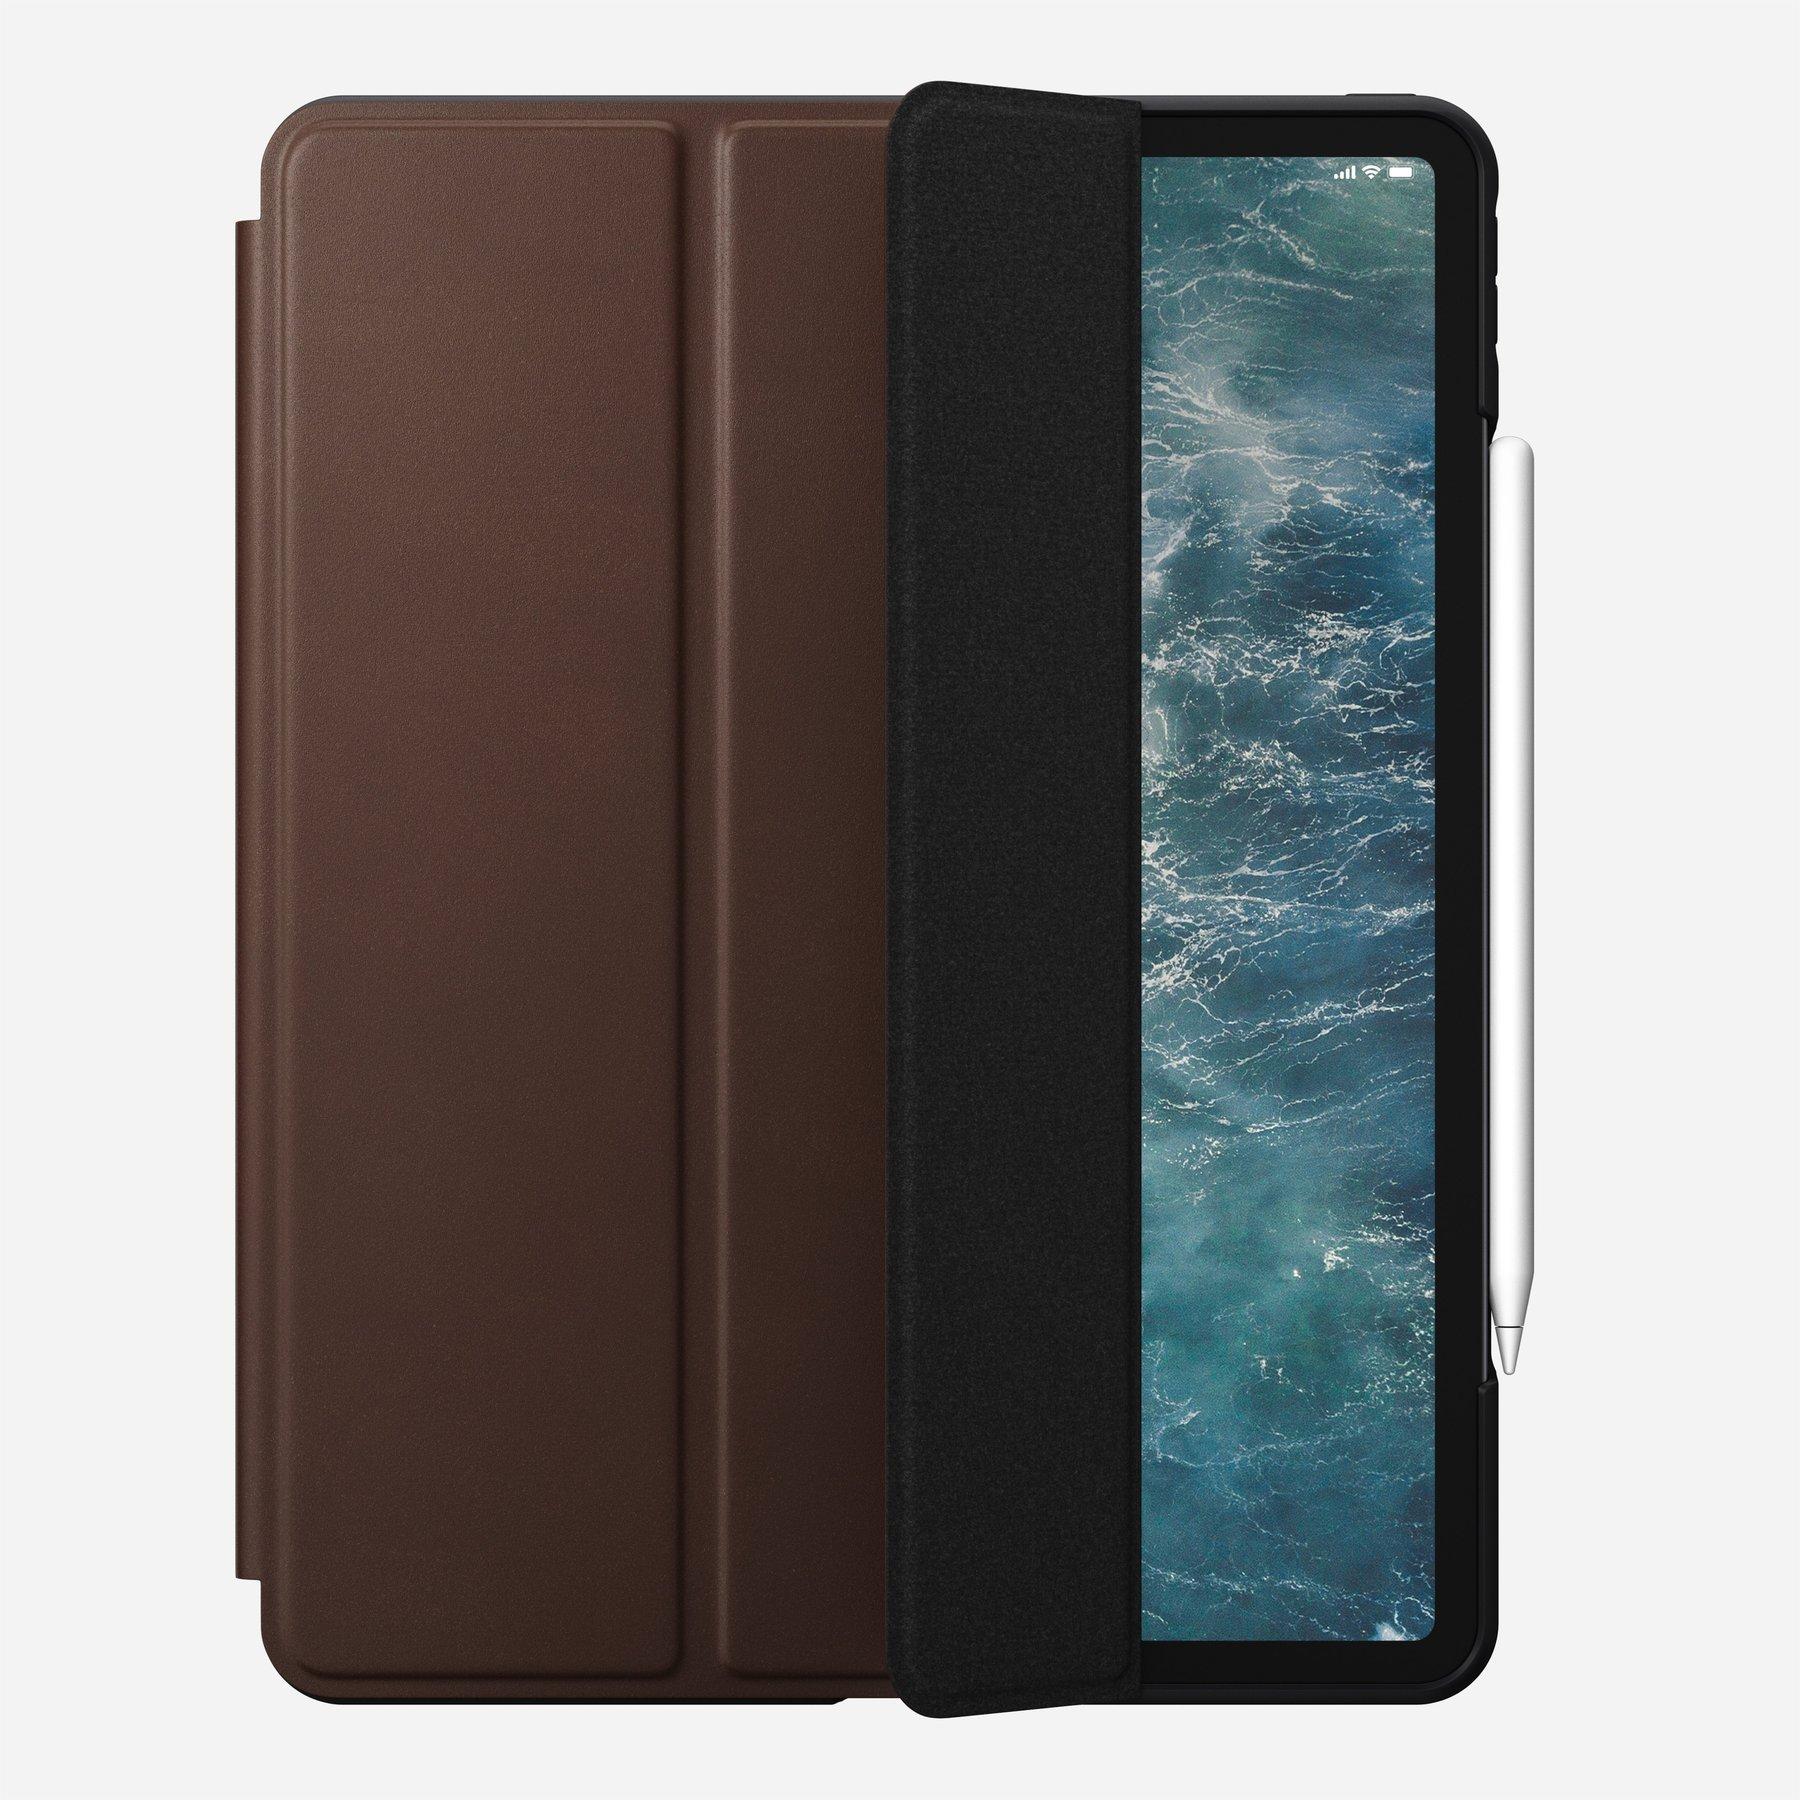 "Nomad Rugged Leather Folio Case für iPad Pro 12,9"" Rustic Brown"